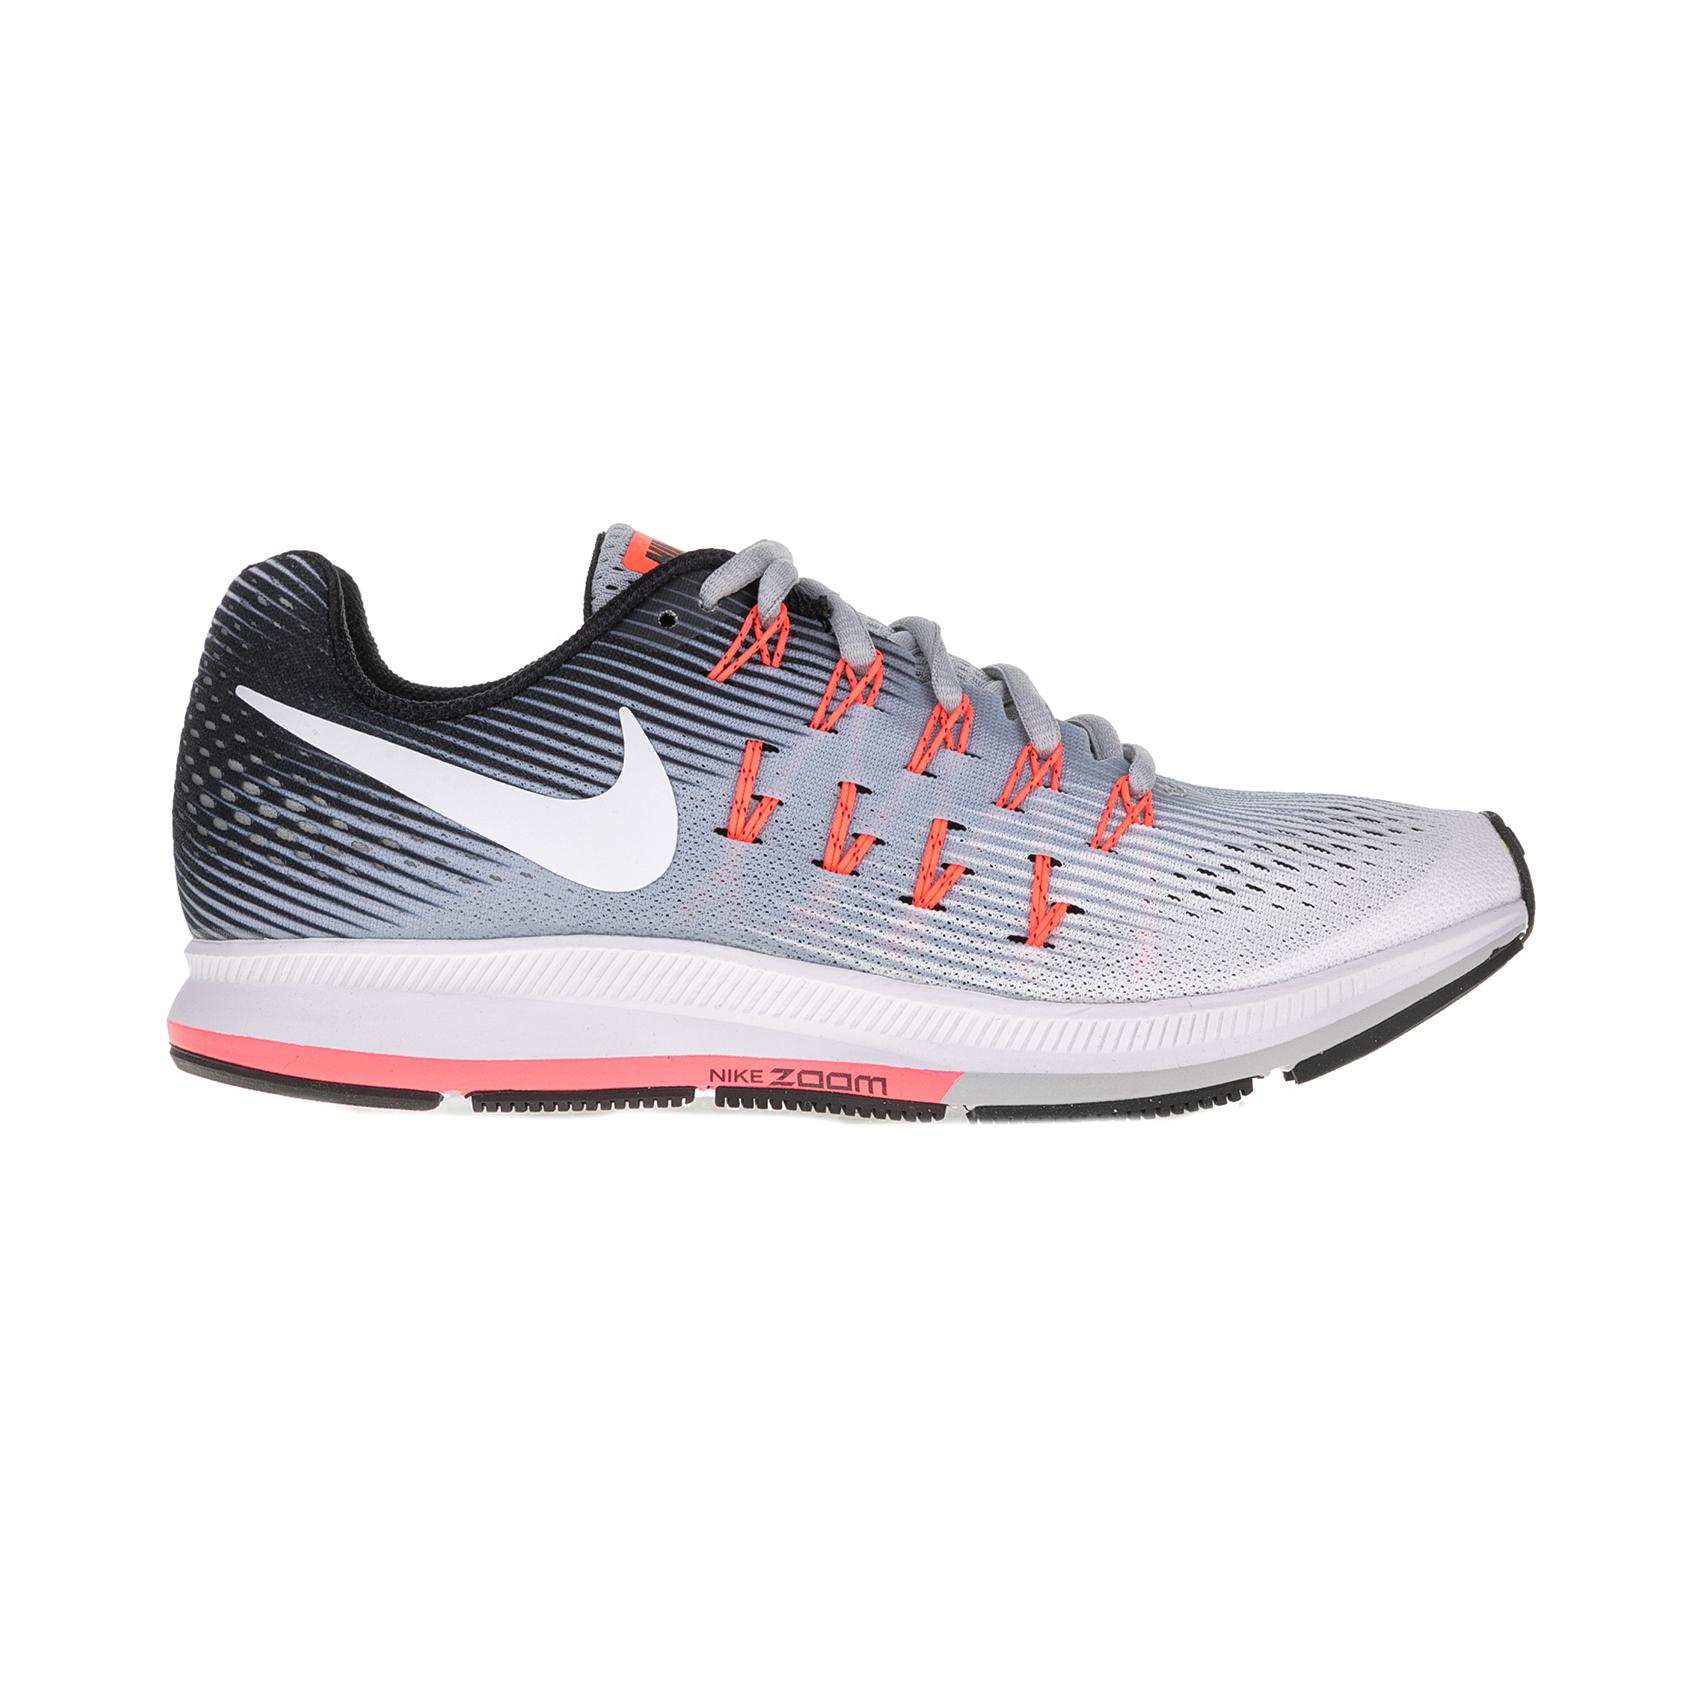 NIKE – Γυναικεία αθλητικά παπούτσια Nike AIR ZOOM PEGASUS 33 γκρι